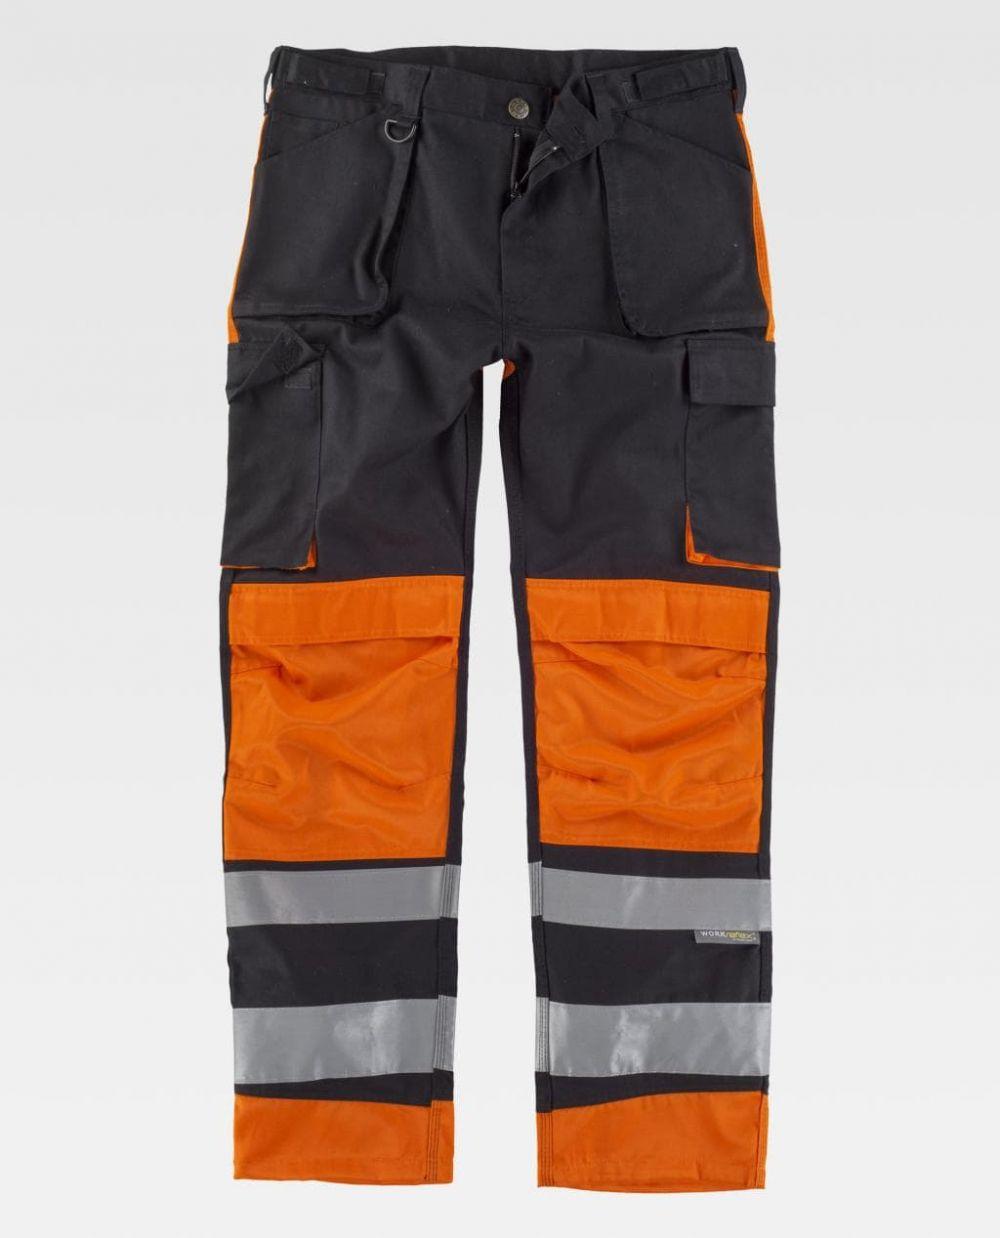 Pantalones reflectantes workteam reflectante combinado de poliéster para personalizar vista 1